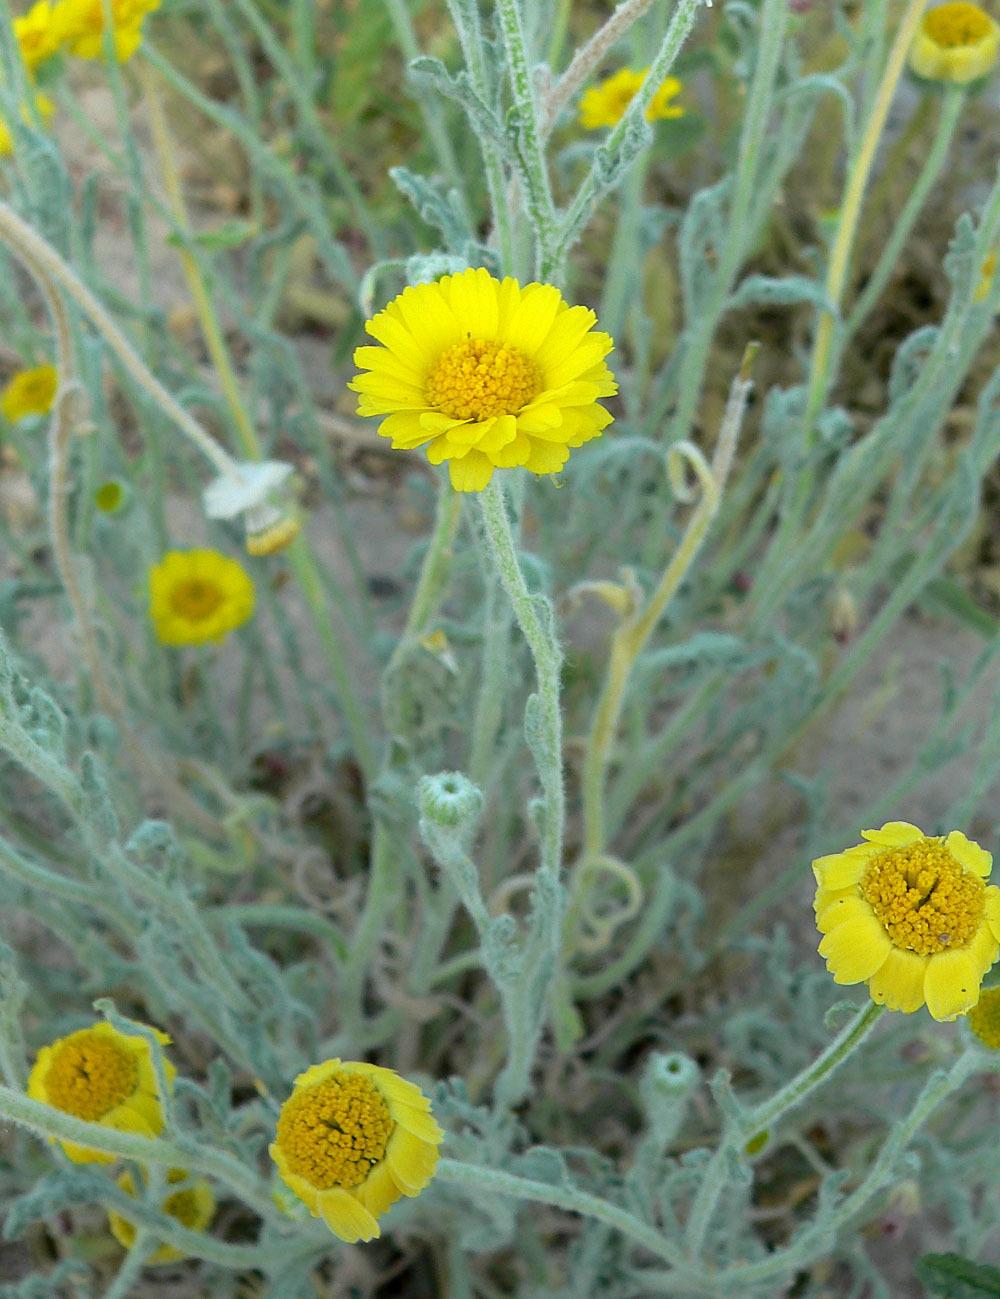 Image of woolly desert marigold